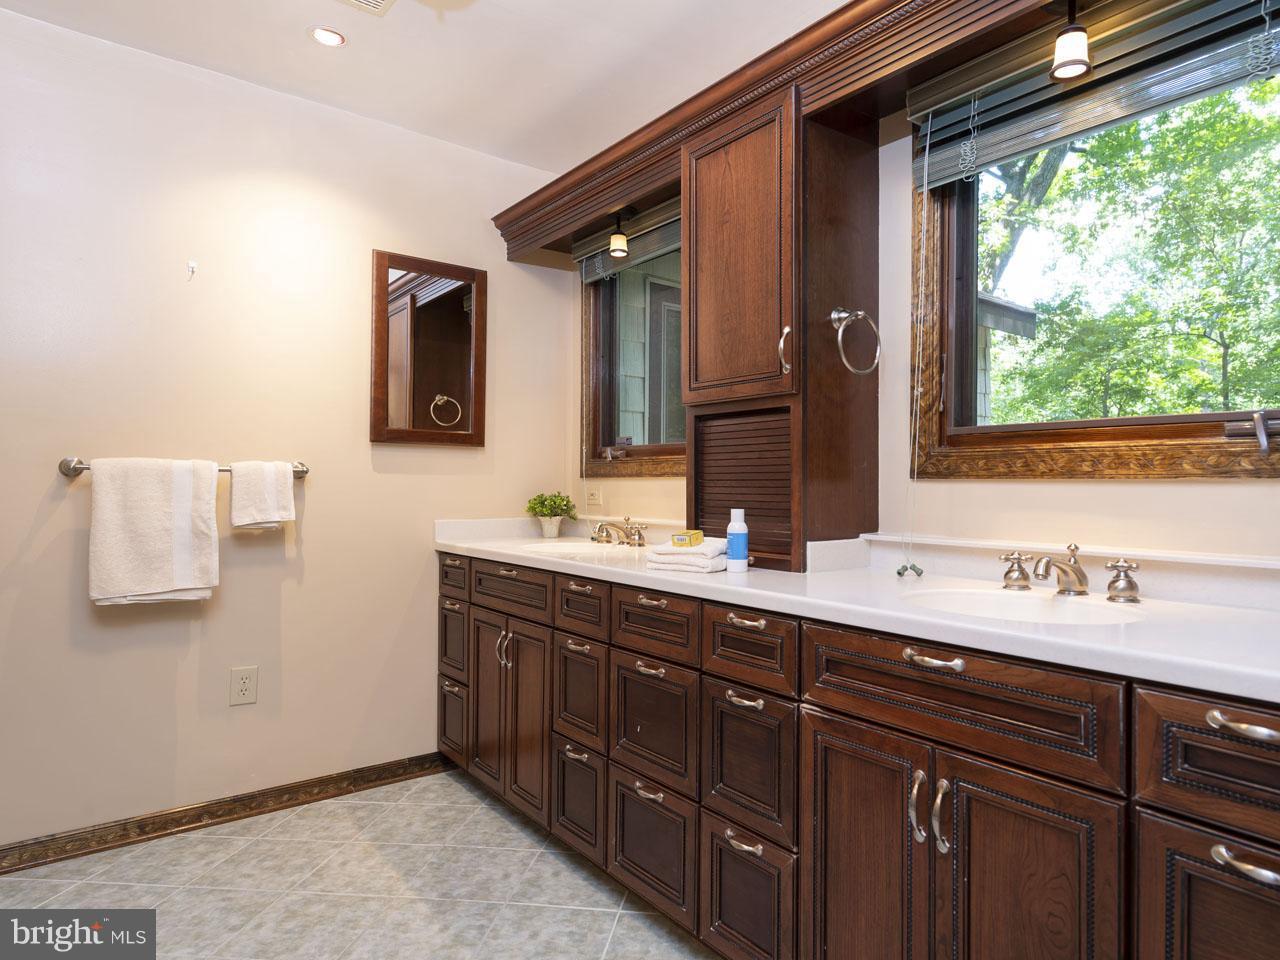 1002303700-300502419374-2021-07-22-03-27-24  |   | Alexandria Delaware Real Estate For Sale | MLS# 1002303700  - Best of Northern Virginia